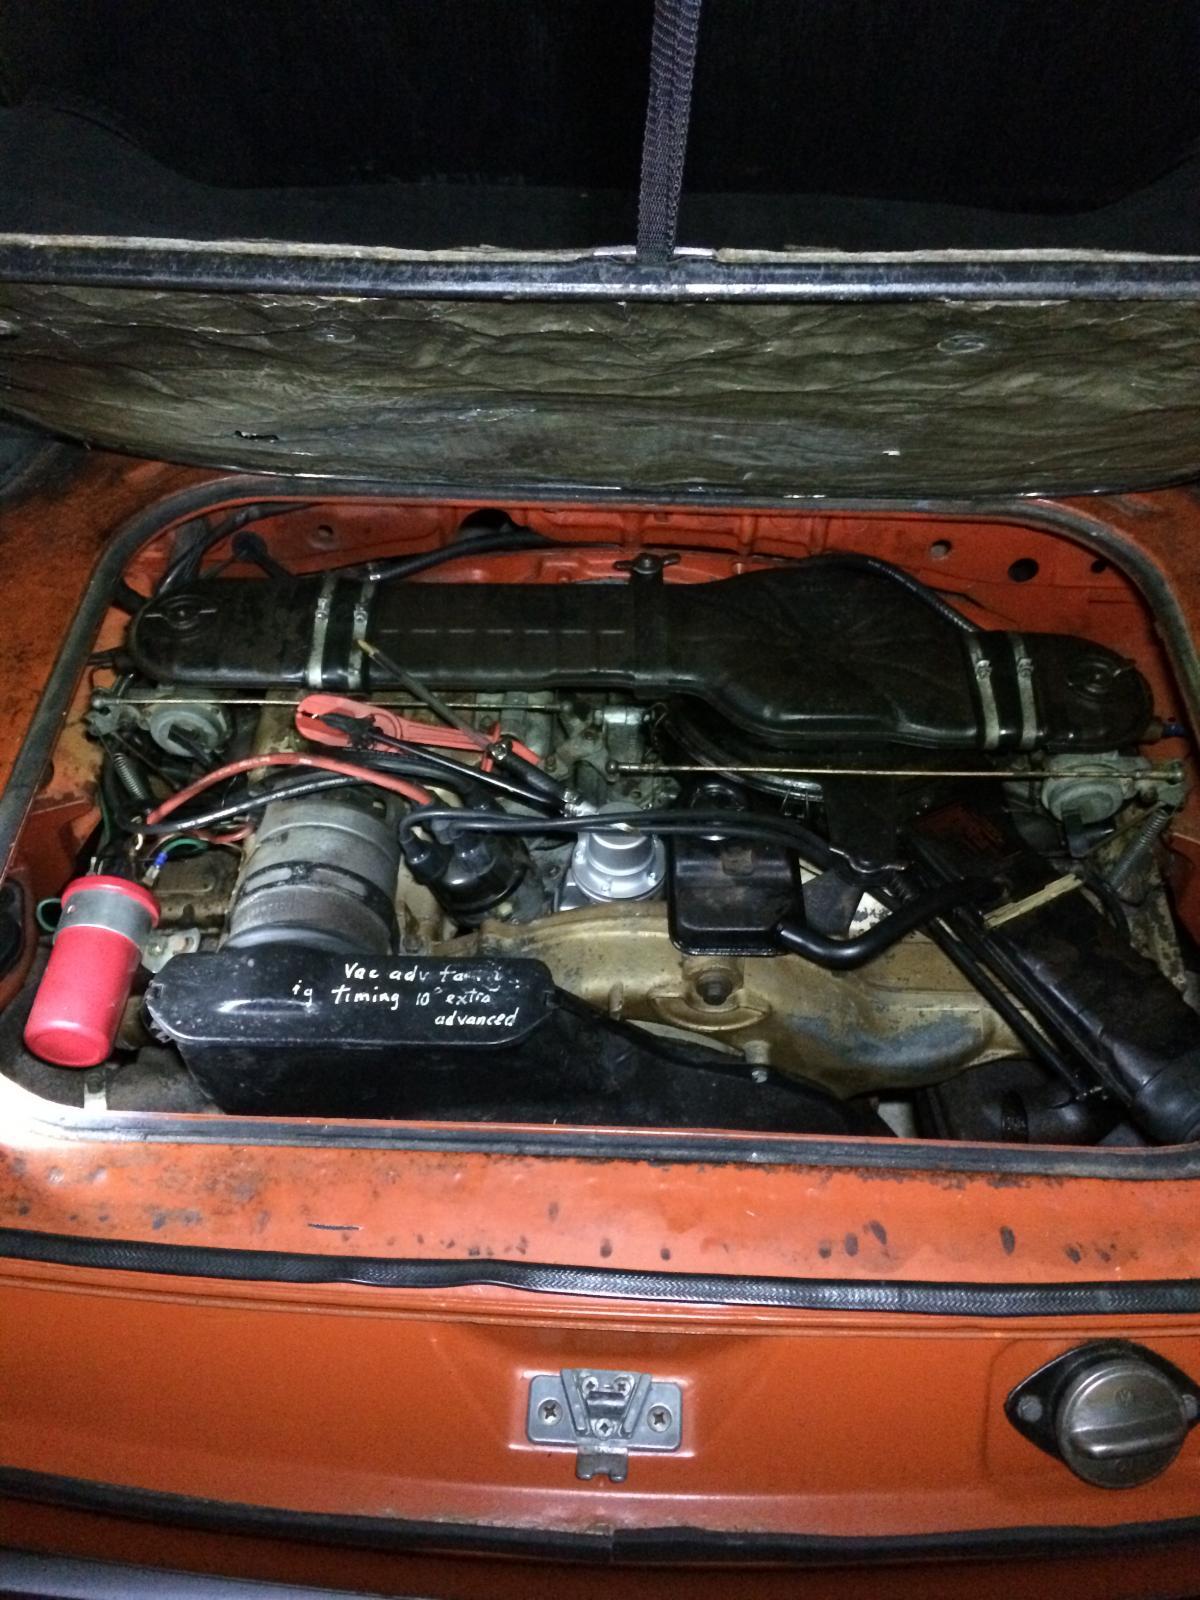 pancake engine, New fuel pump